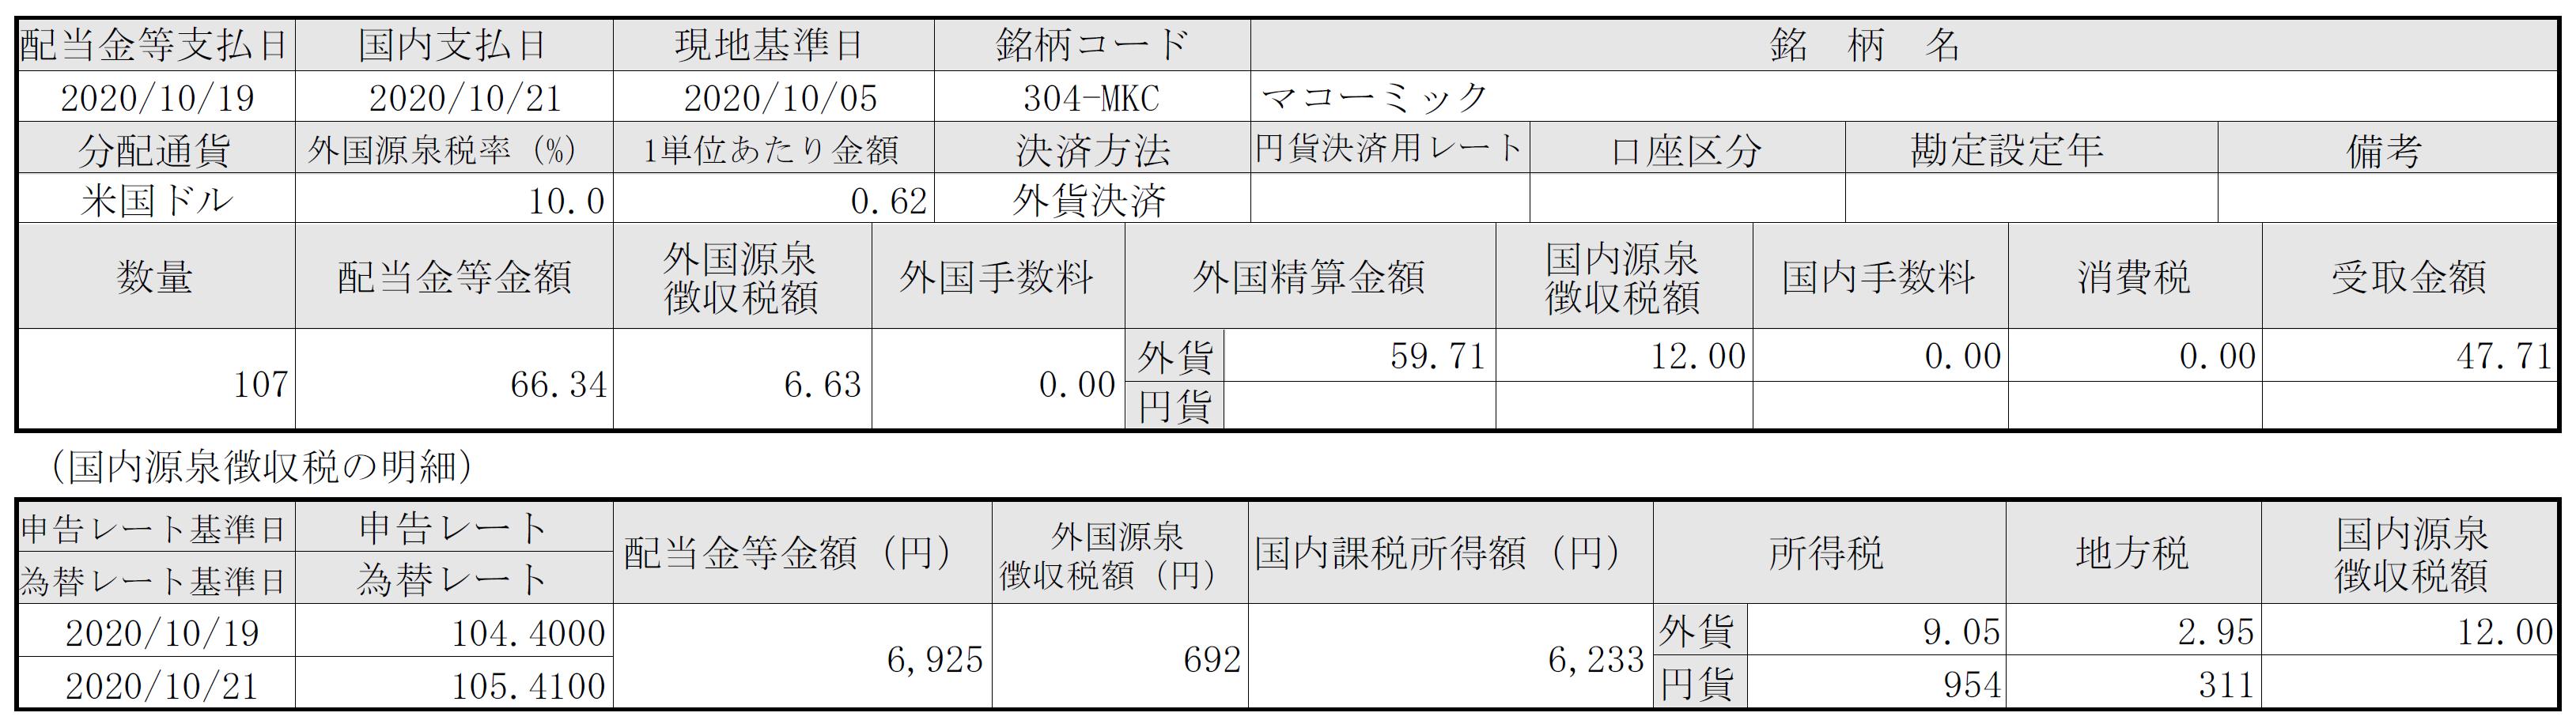 f:id:hodo-work:20201110193303p:plain